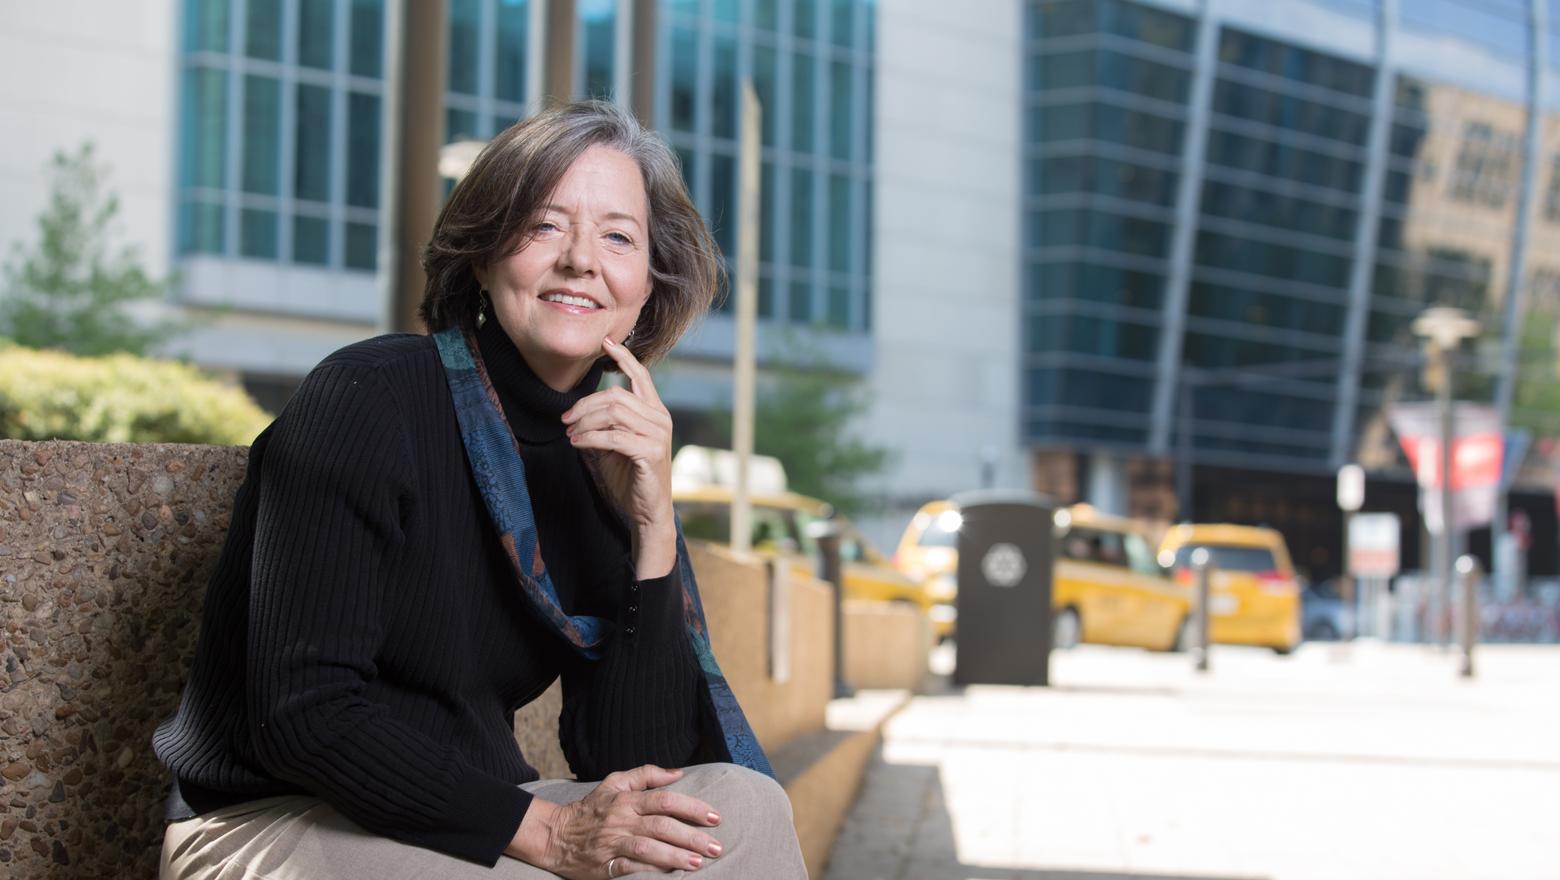 Lynne H. Rambo